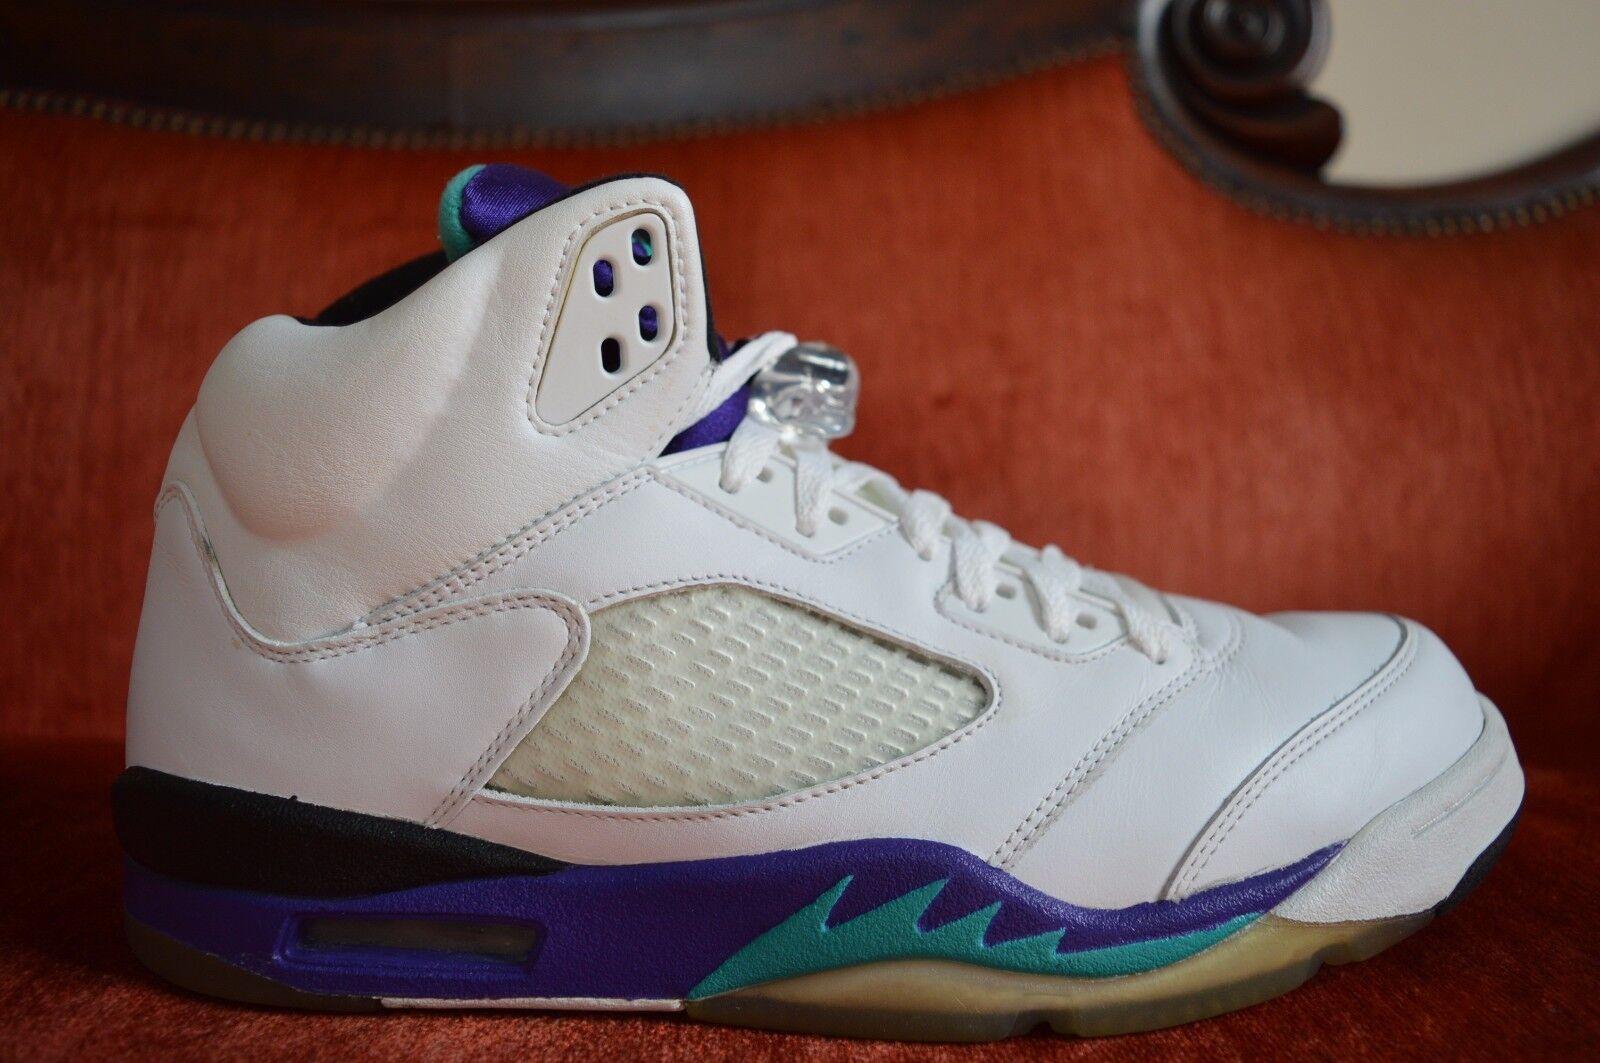 WORN TWICE TWICE TWICE Nike Air Jordan Retro V 5 Size 11 2006 LS White Grape Emerald Bred c9134f